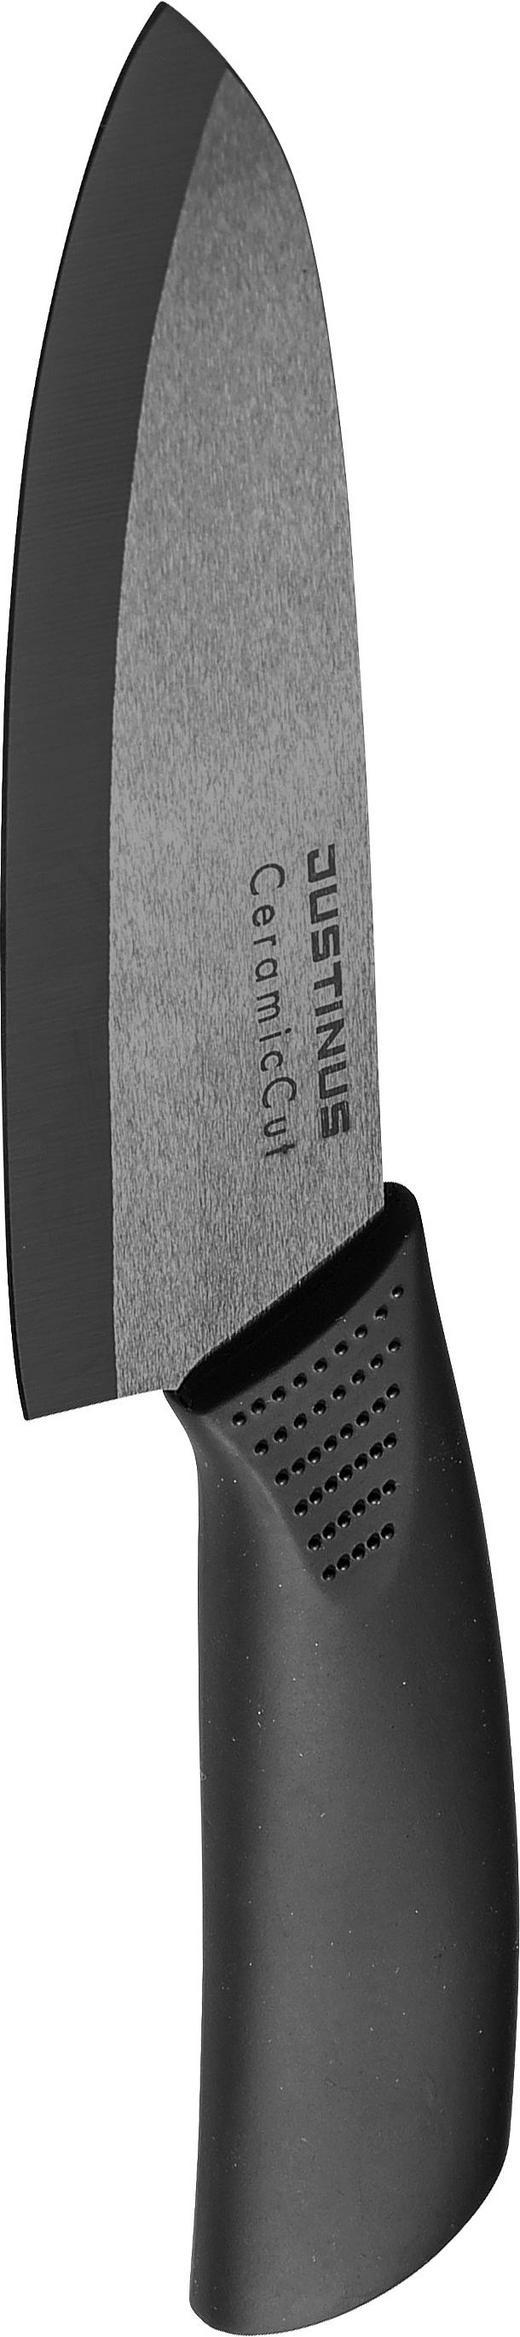 KUHINJSKI NOŽ 234940, 15 CM - črna, Konvencionalno, umetna masa/keramika (27cm) - Justinus